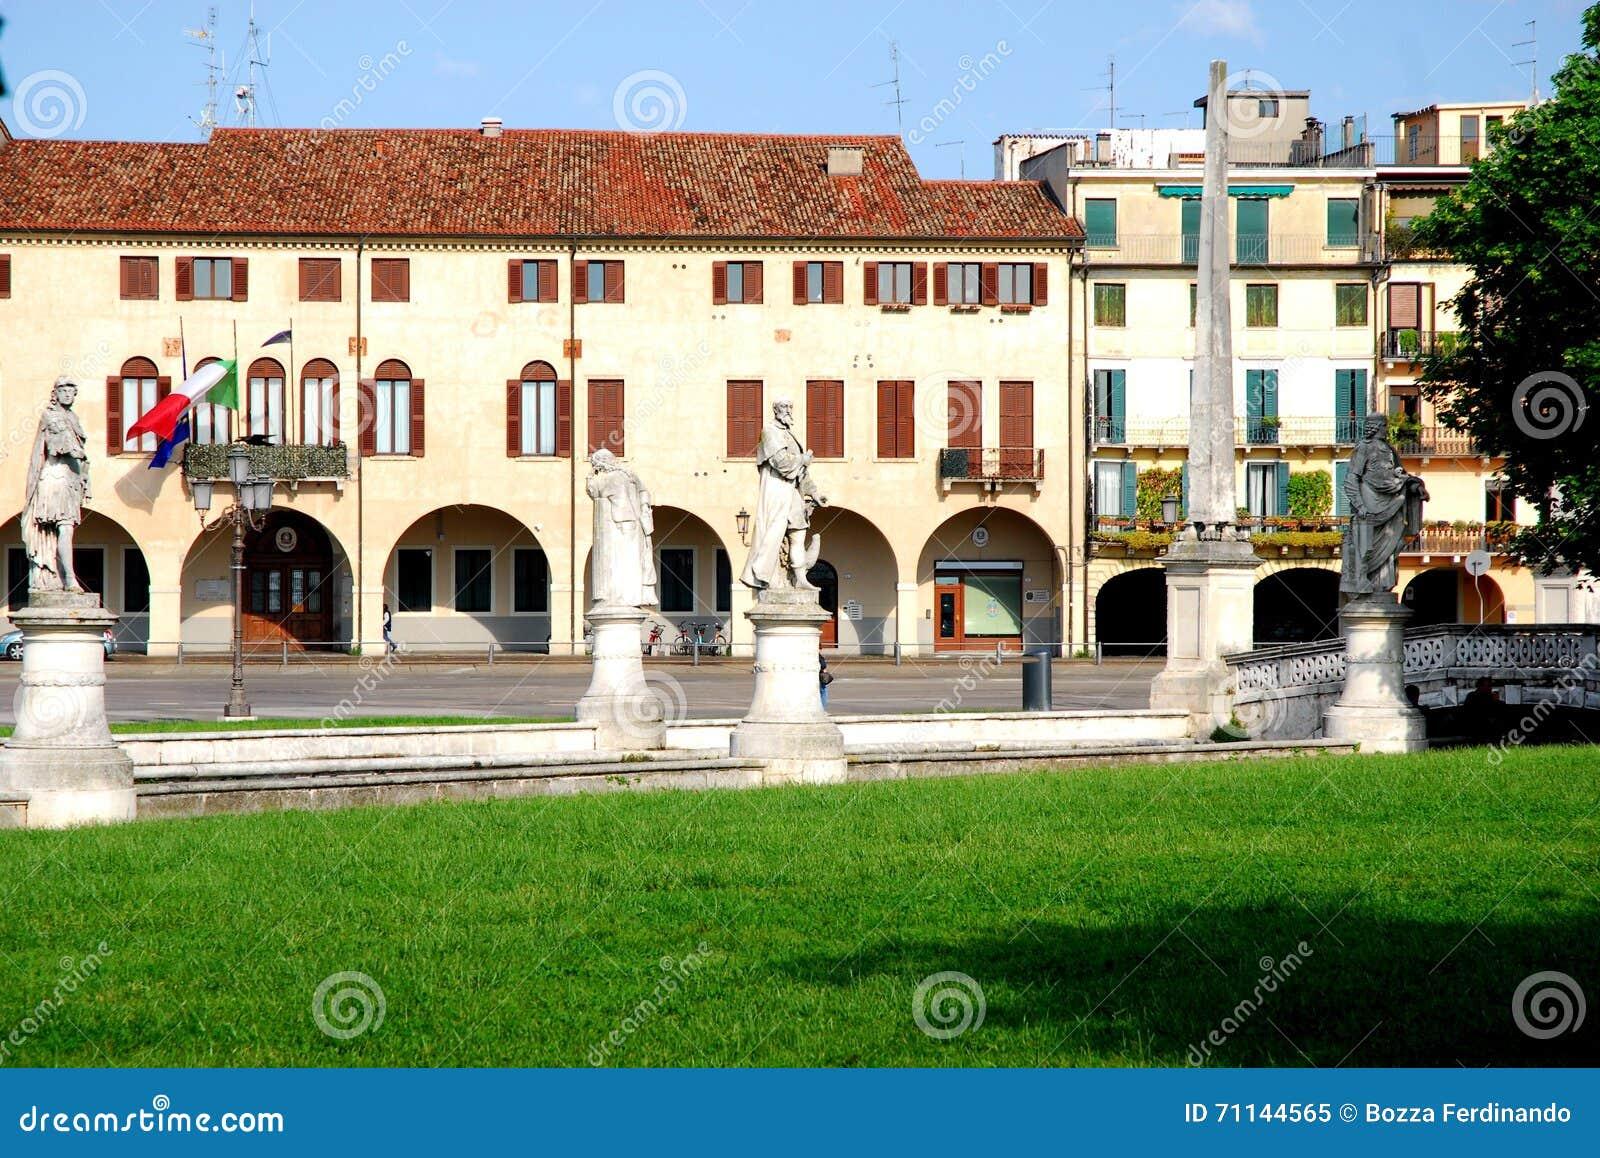 Casas del perímetro de Prato visto de la isla Memmia en el della Valle de Prato en Padua en el Véneto (Italia)